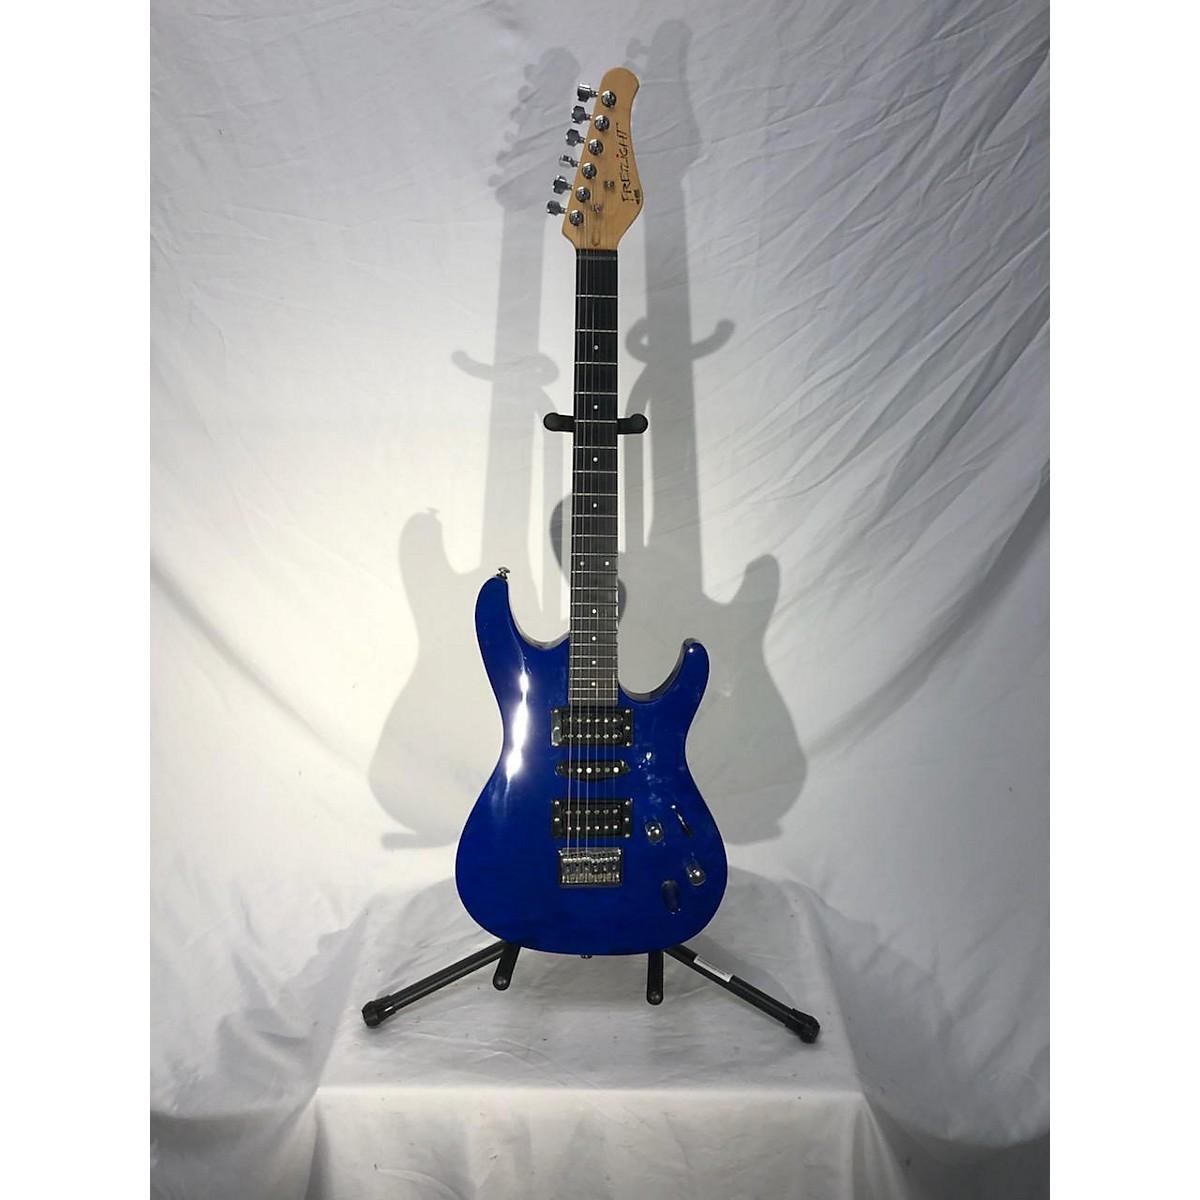 Fretlight 400 Solid Body Electric Guitar